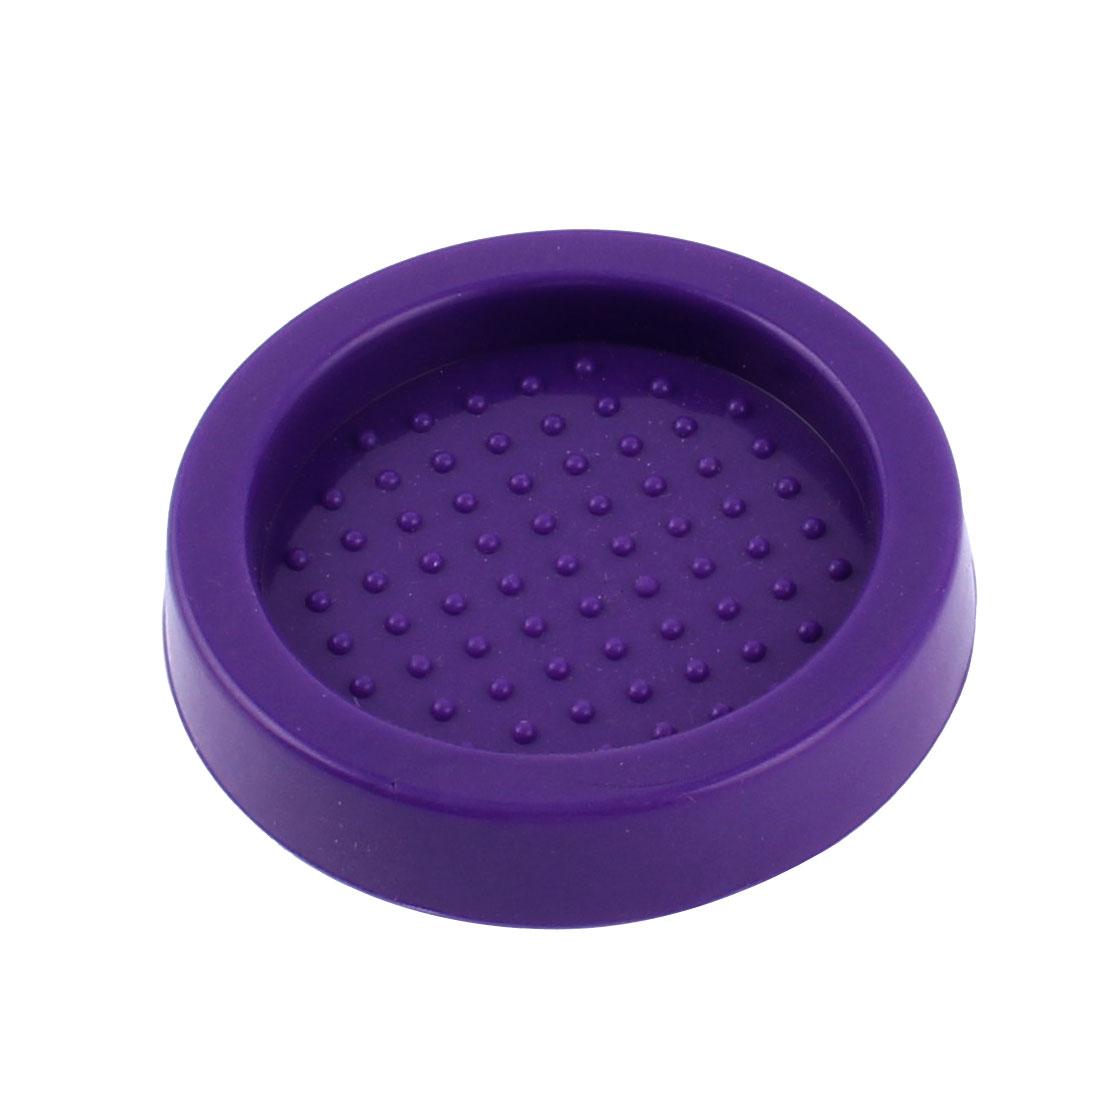 Purple Rubber Round 60mm Dia Coffee Tamper Base Seat Holder Tamping Mat Pad